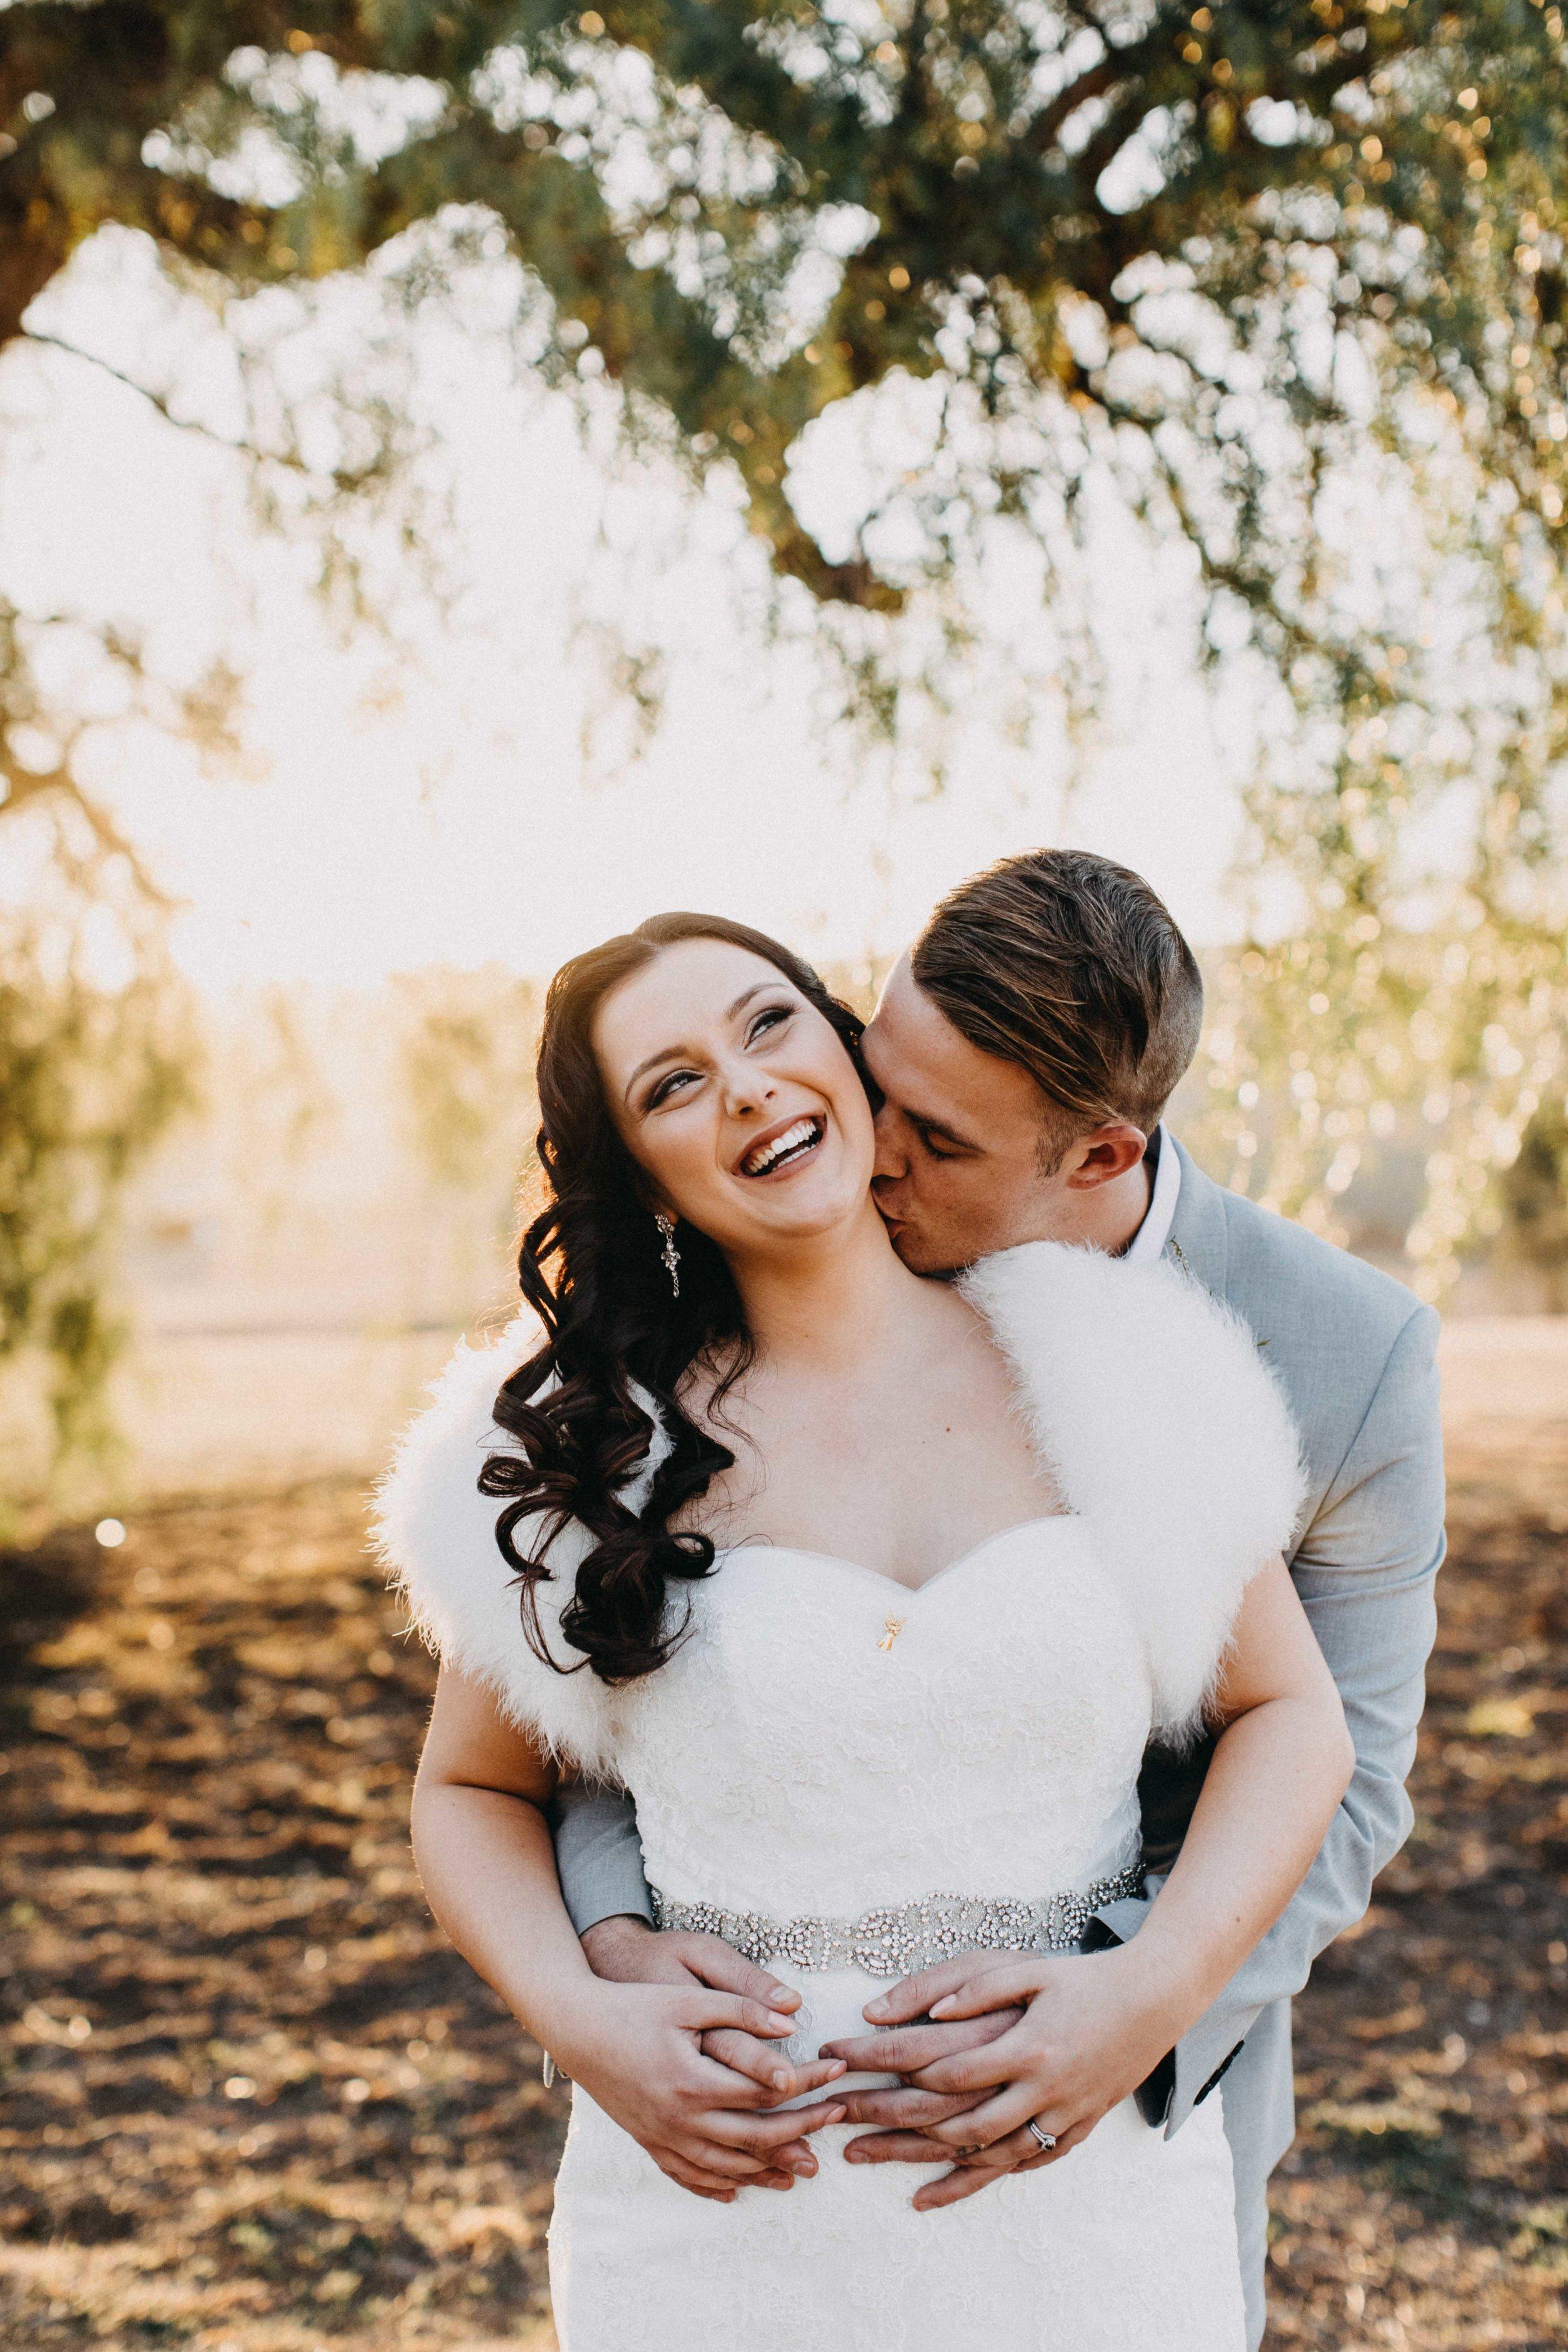 burnham-grove-camden-wedding-emilyobrienphotography-macarthur-125.jpg